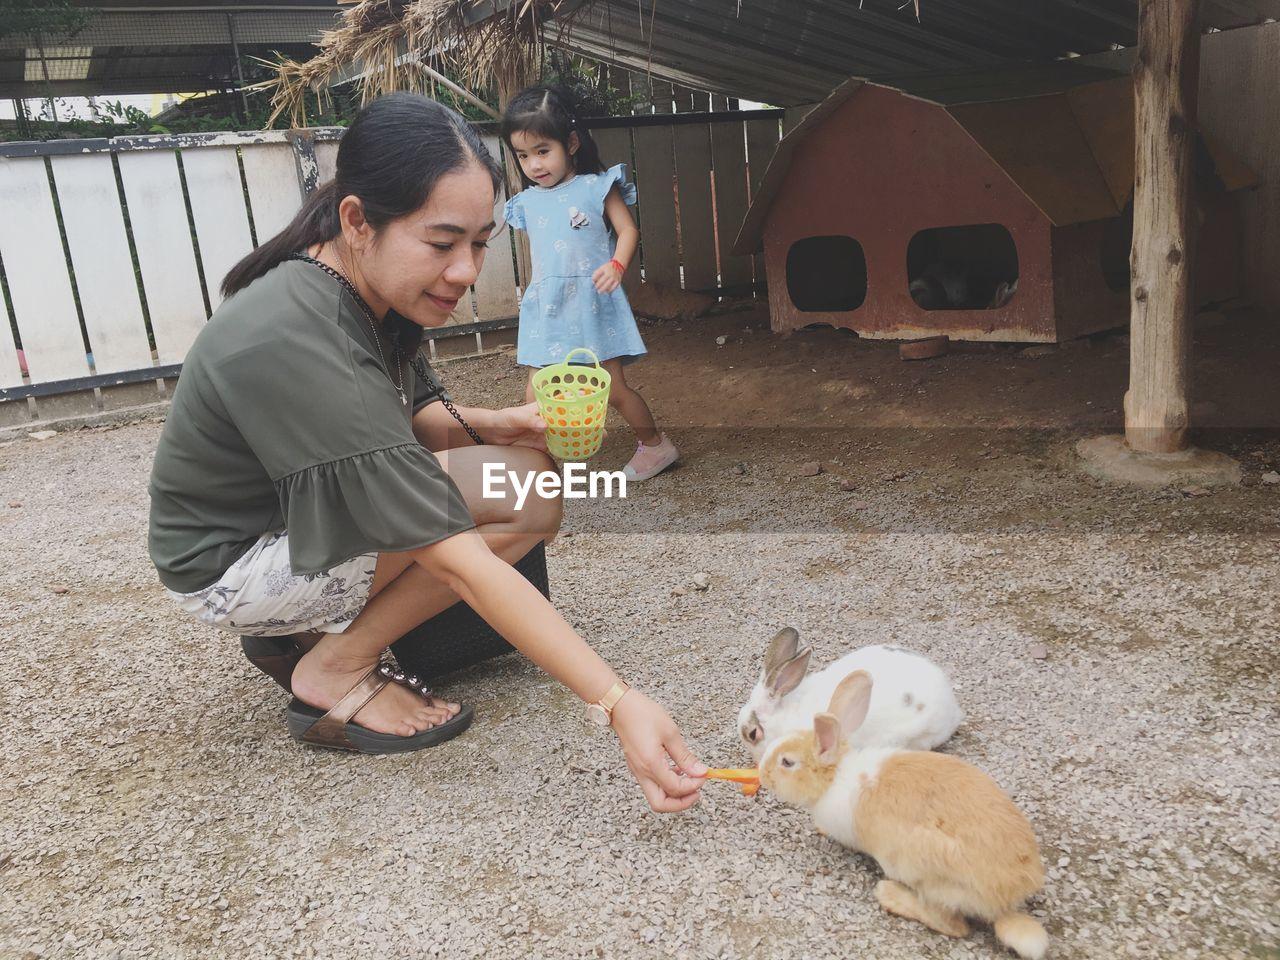 Smiling woman feeding rabbit outdoors